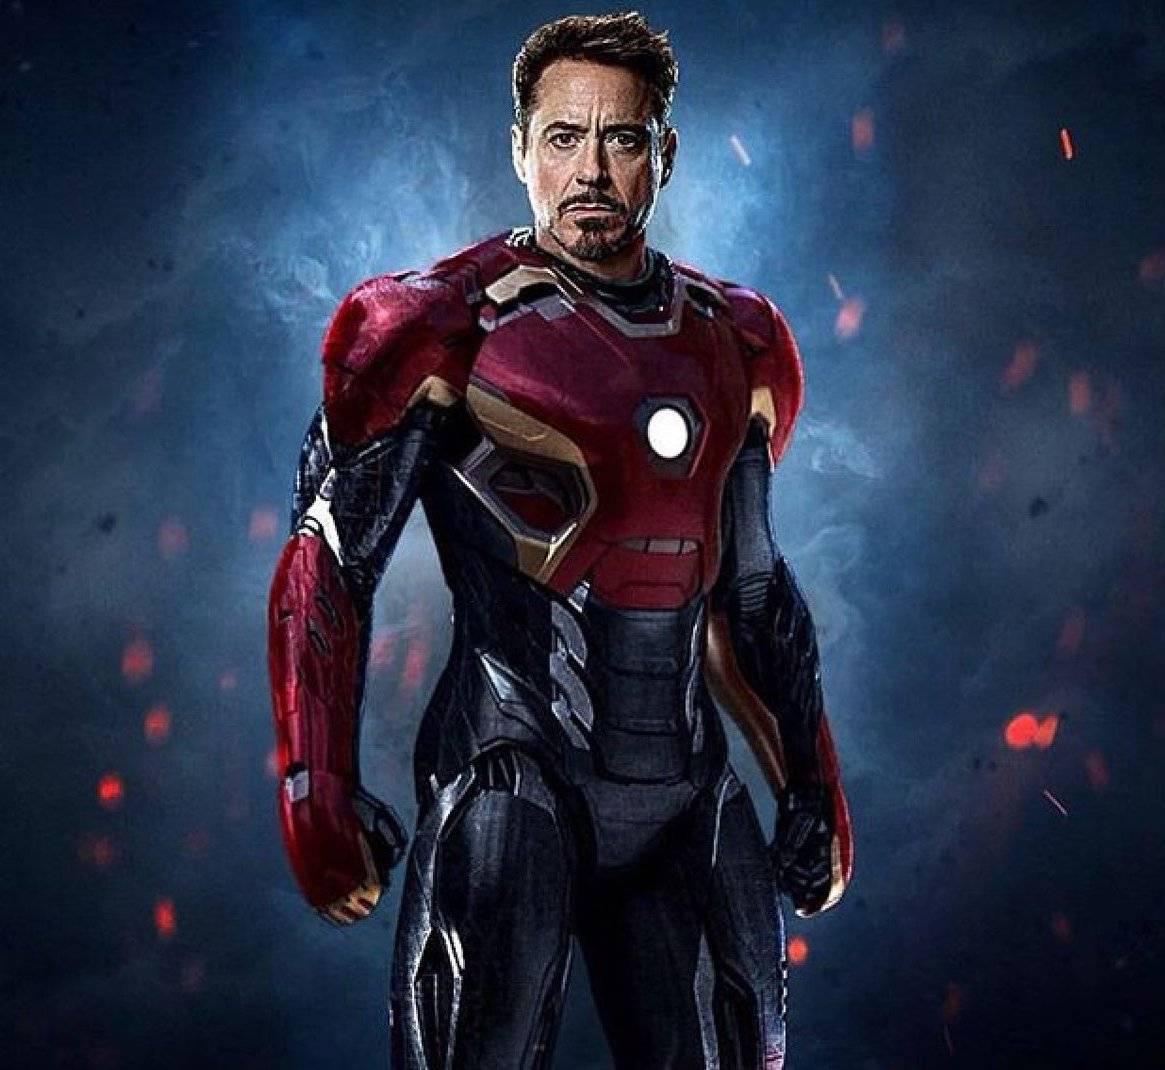 Robert Downey Jr. Blockbuster